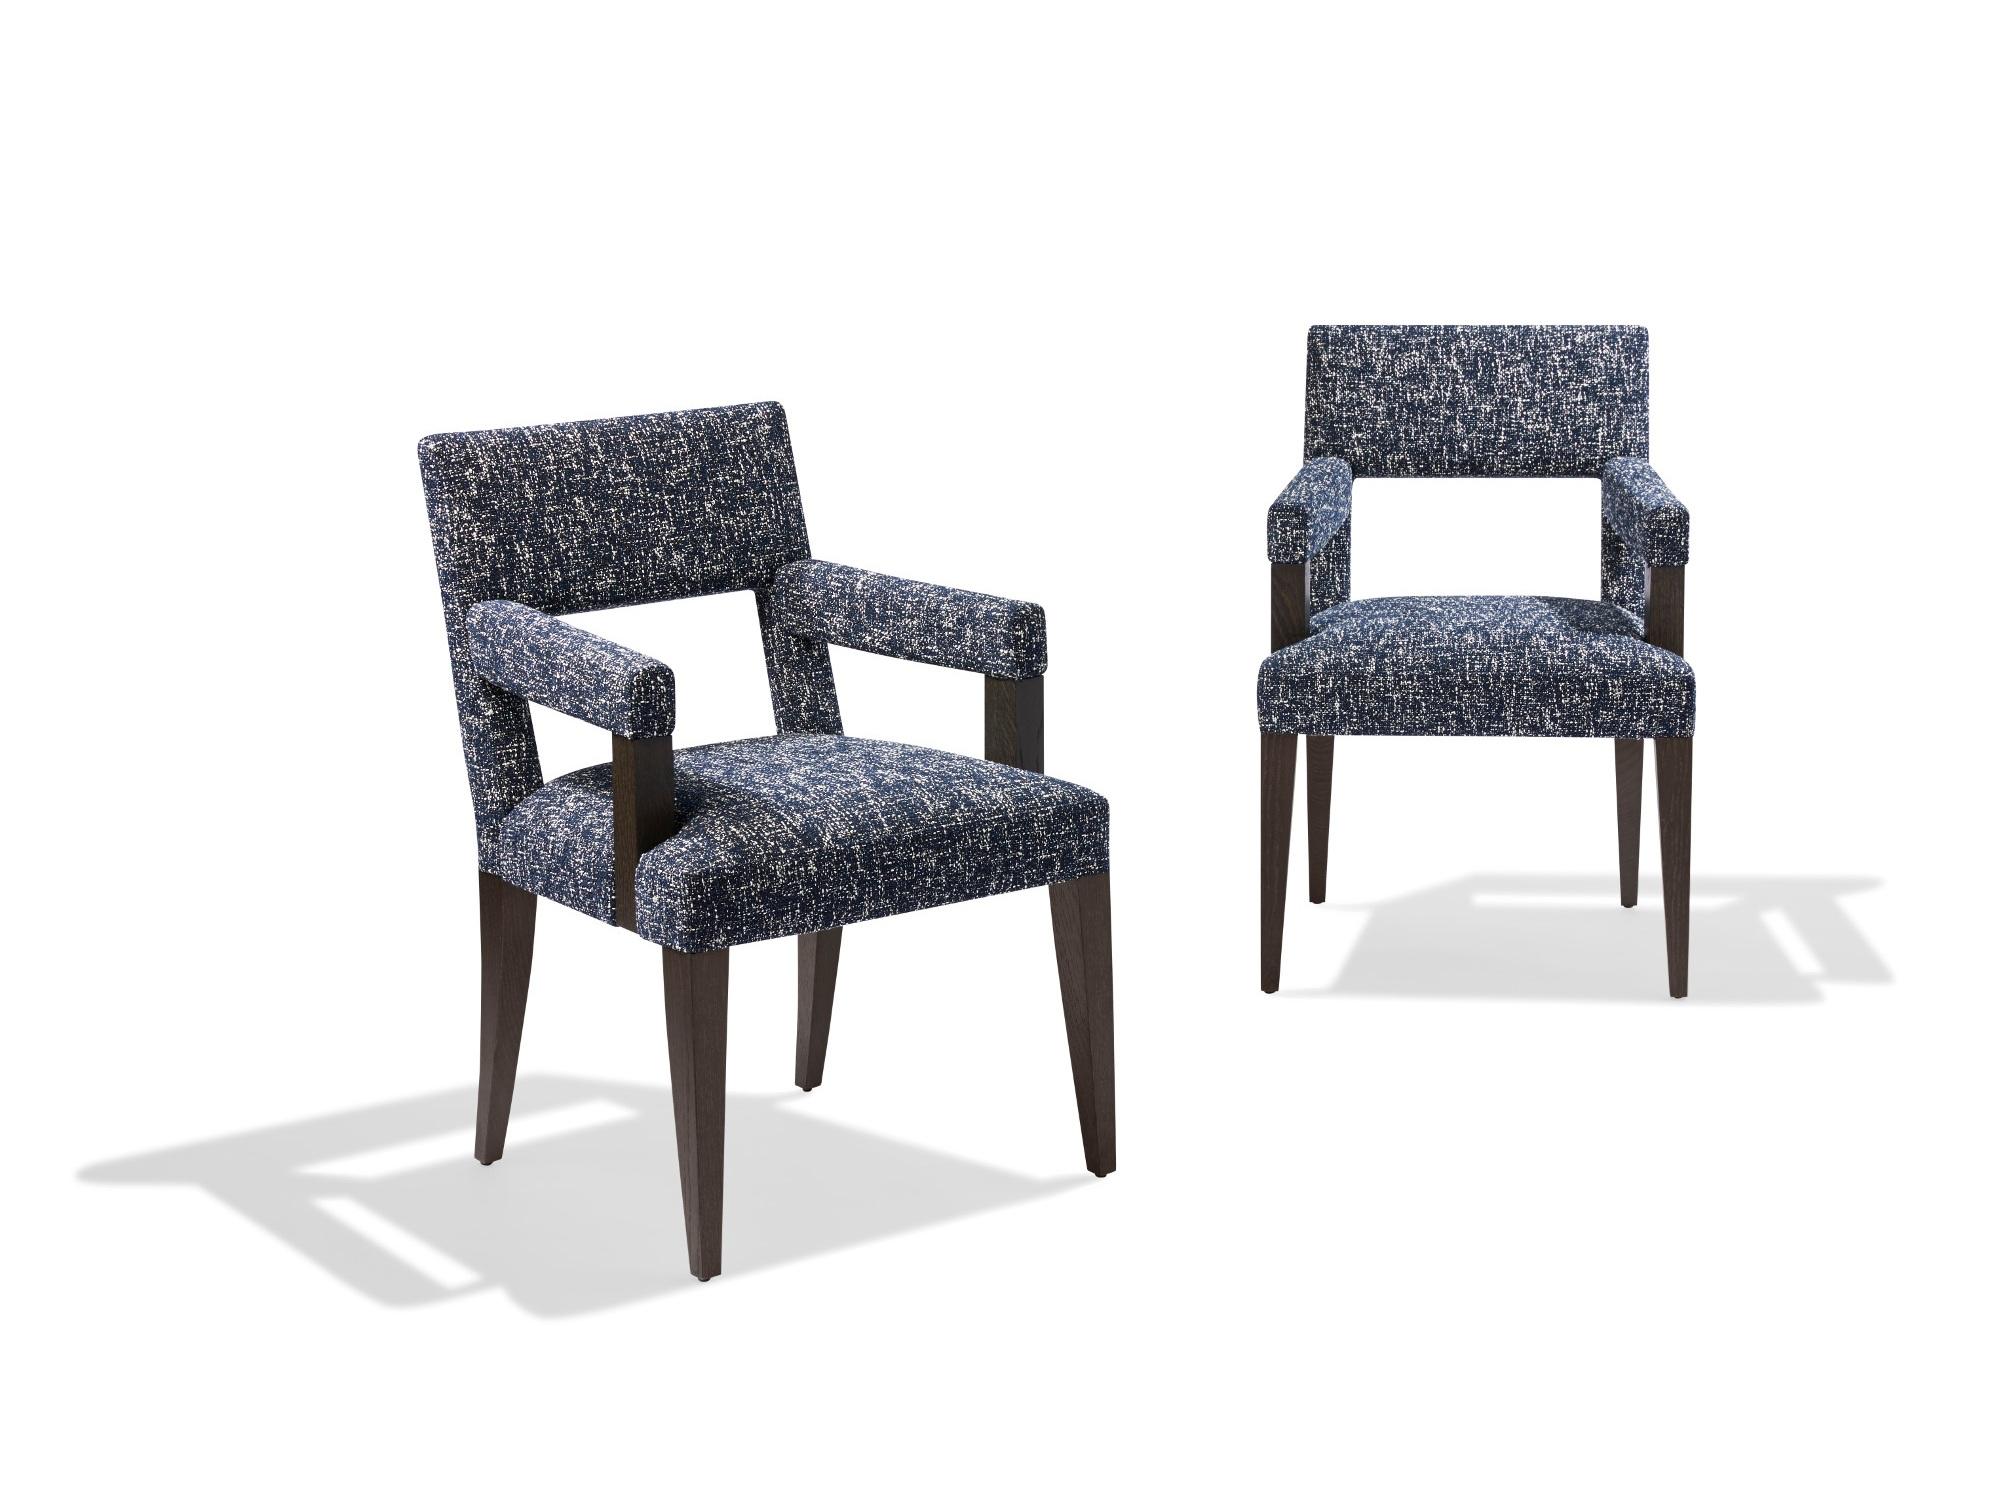 Maiko-fauteuil-2019.jpg